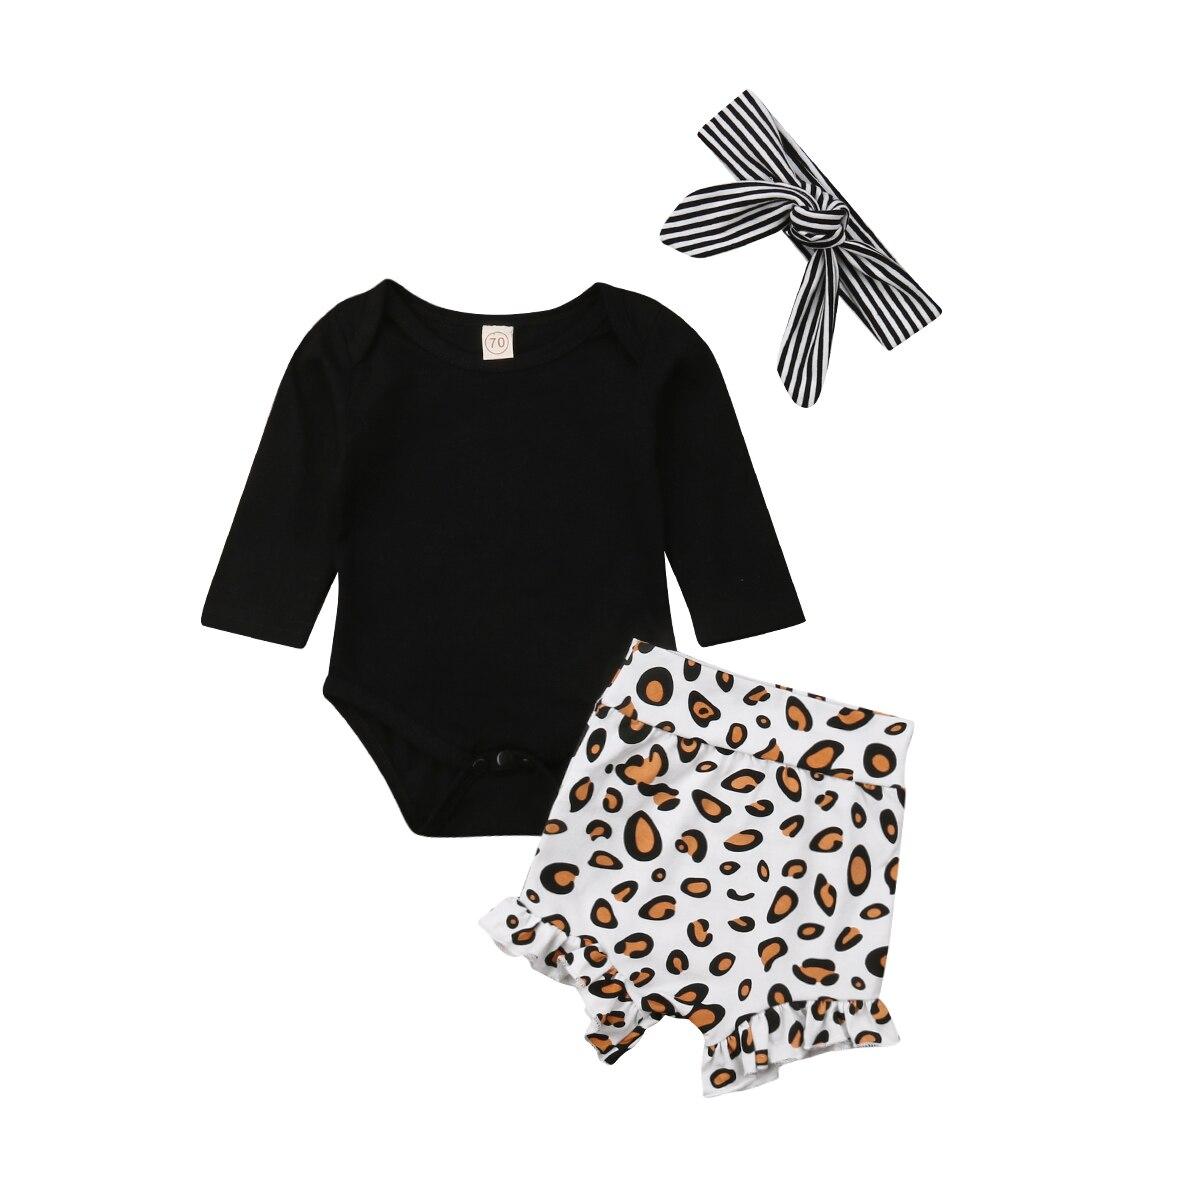 HTB1g6HRacnrK1RjSspkq6yuvXXar Newborn Kids Baby Girls Long Sleeve Leopard print Clothes Romper Pants Headband Outfit